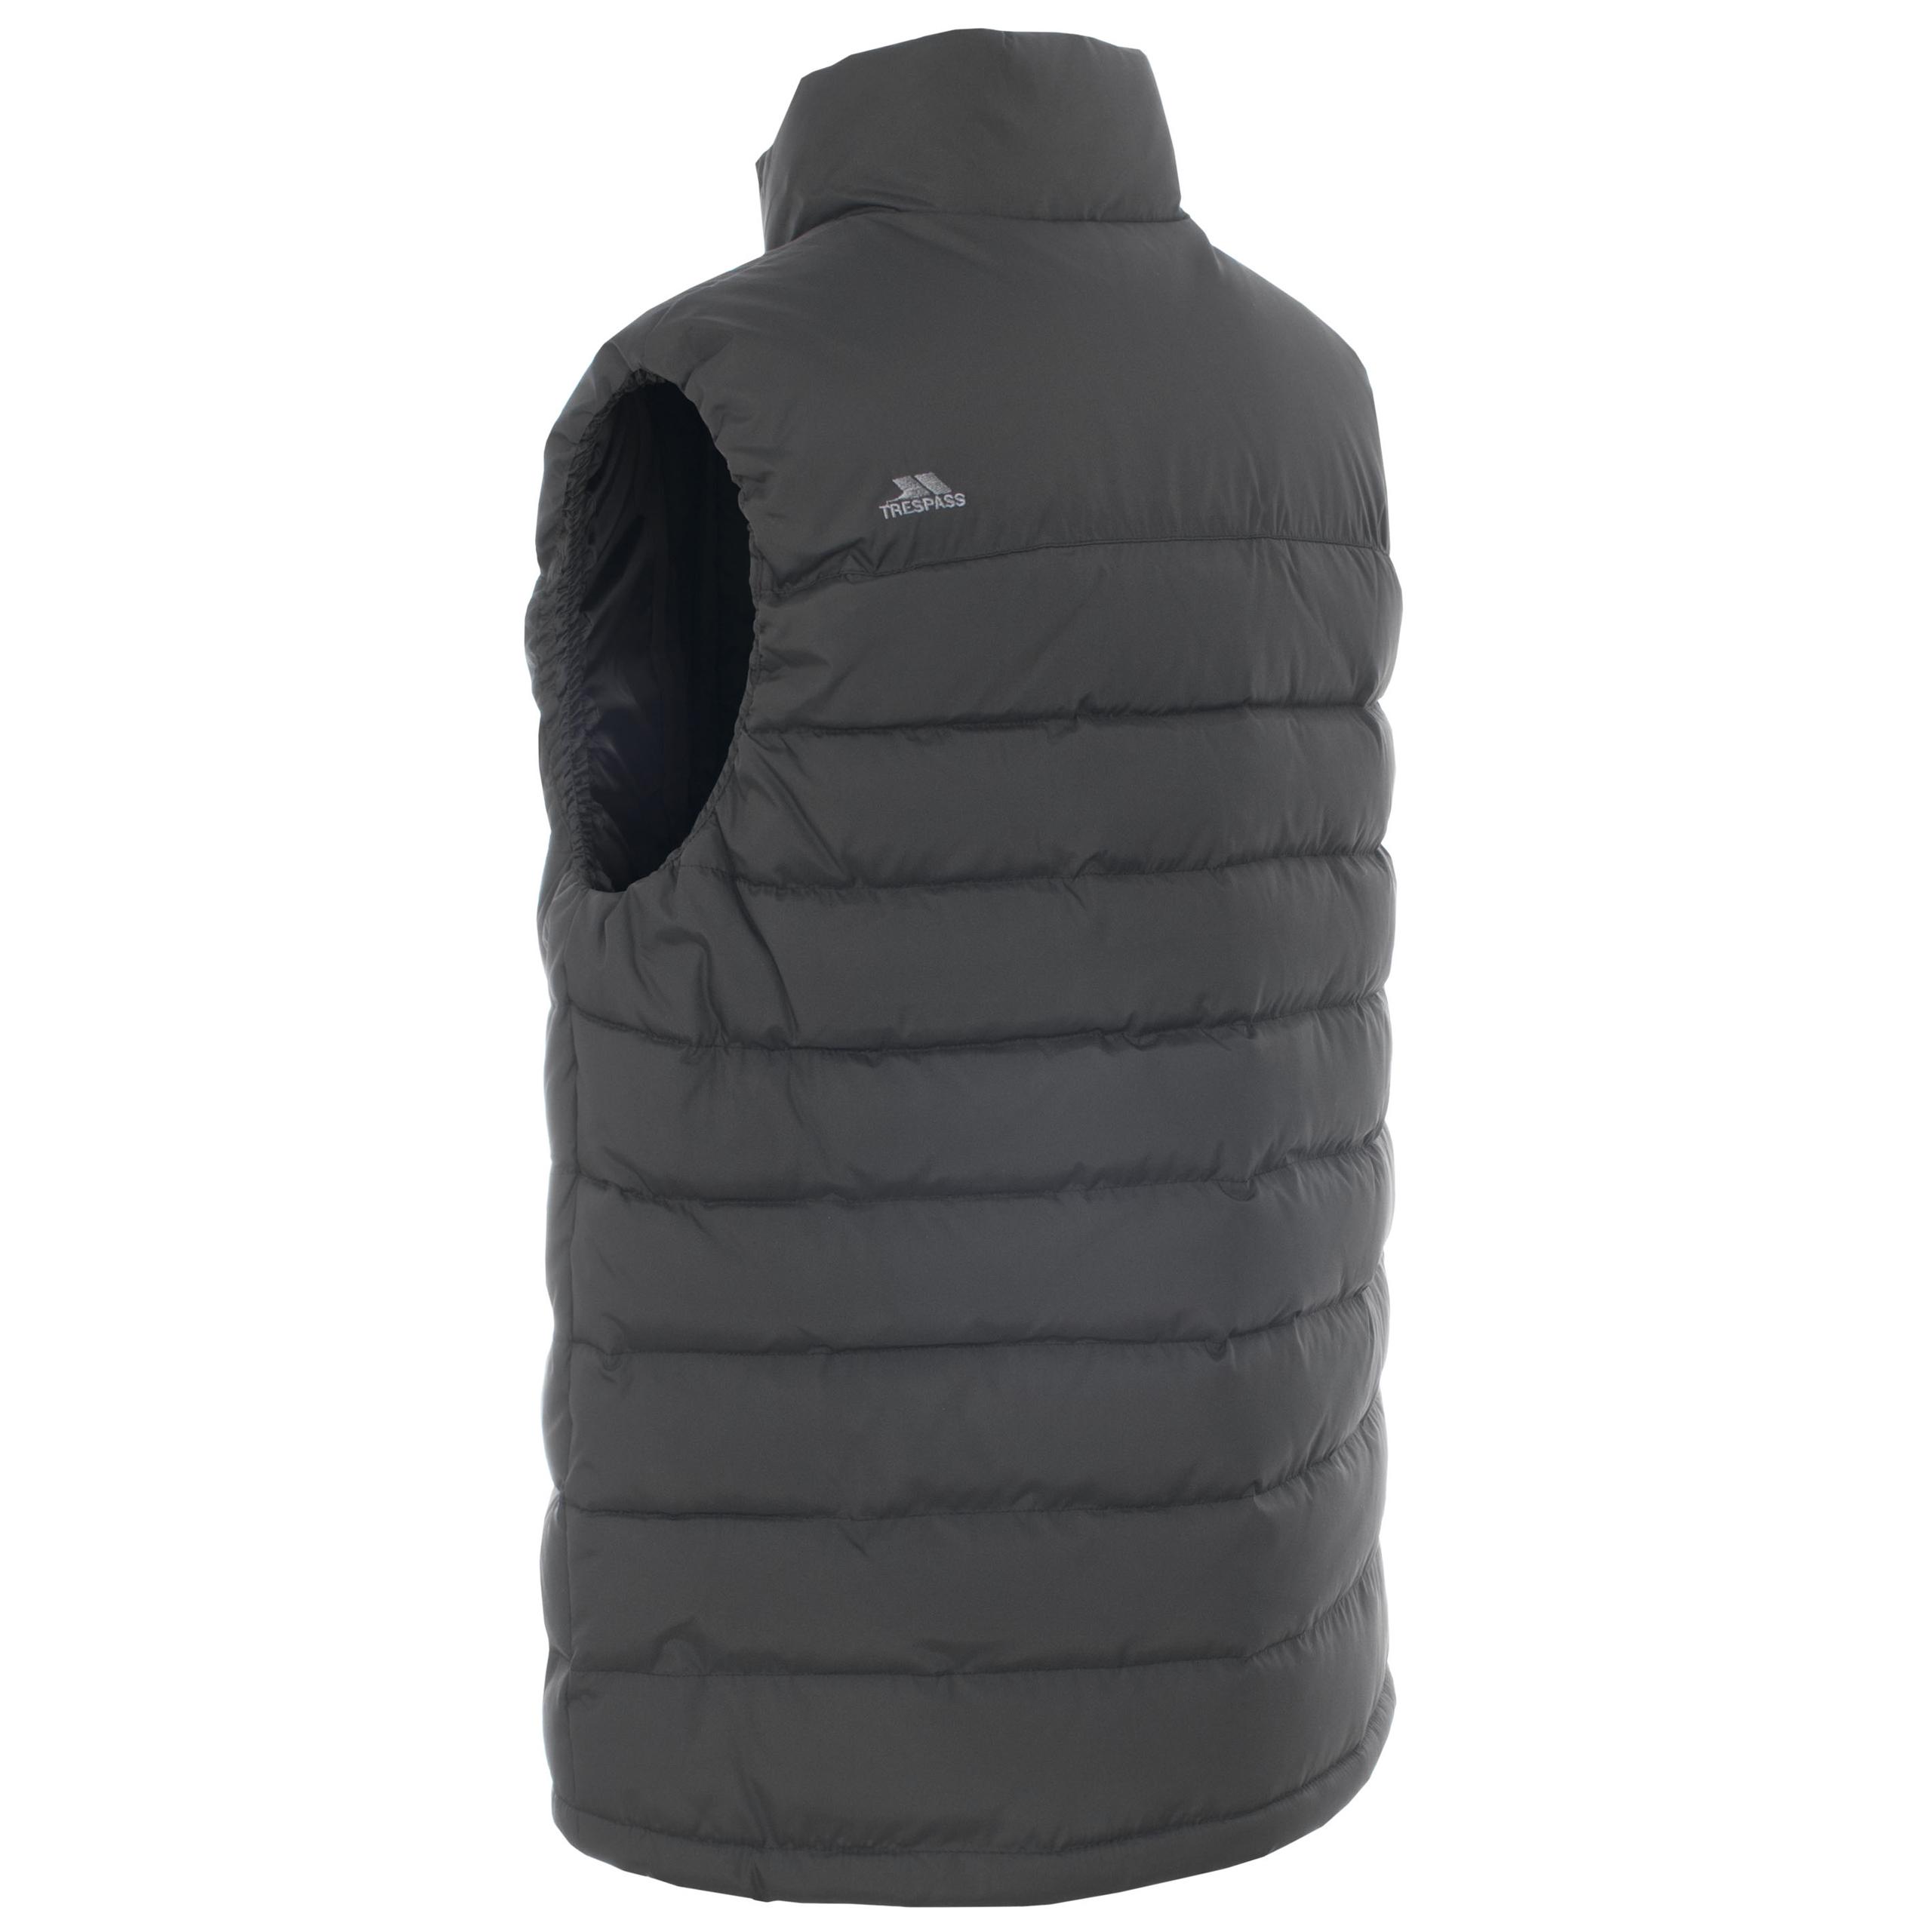 trespass hollow mens padded body warmer sleeveless jacket. Black Bedroom Furniture Sets. Home Design Ideas